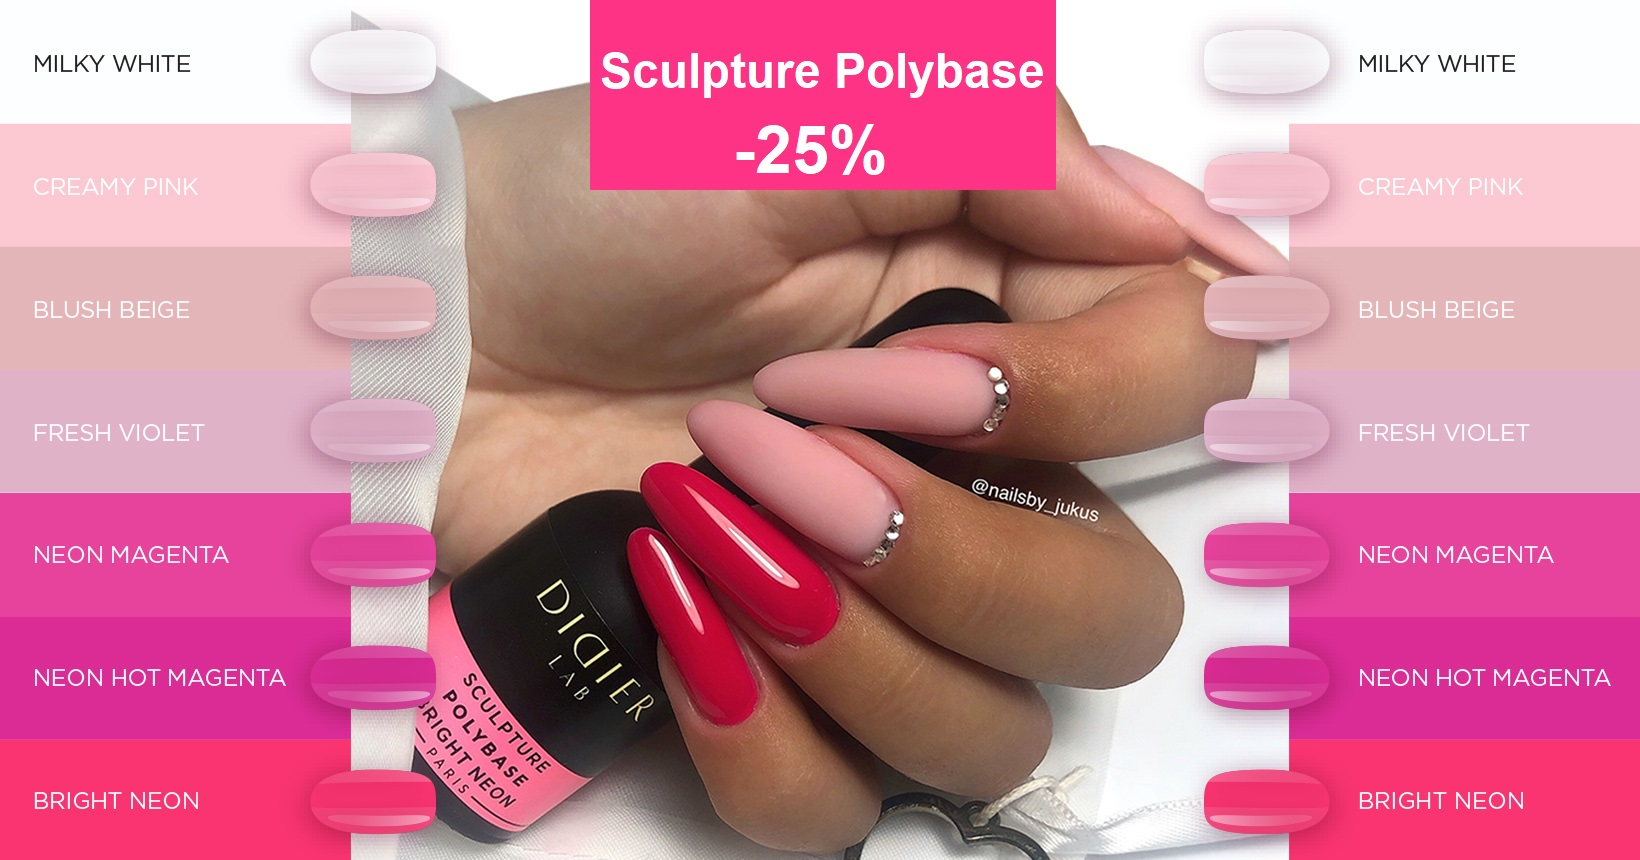 Sculpture Polybase -25% reducere